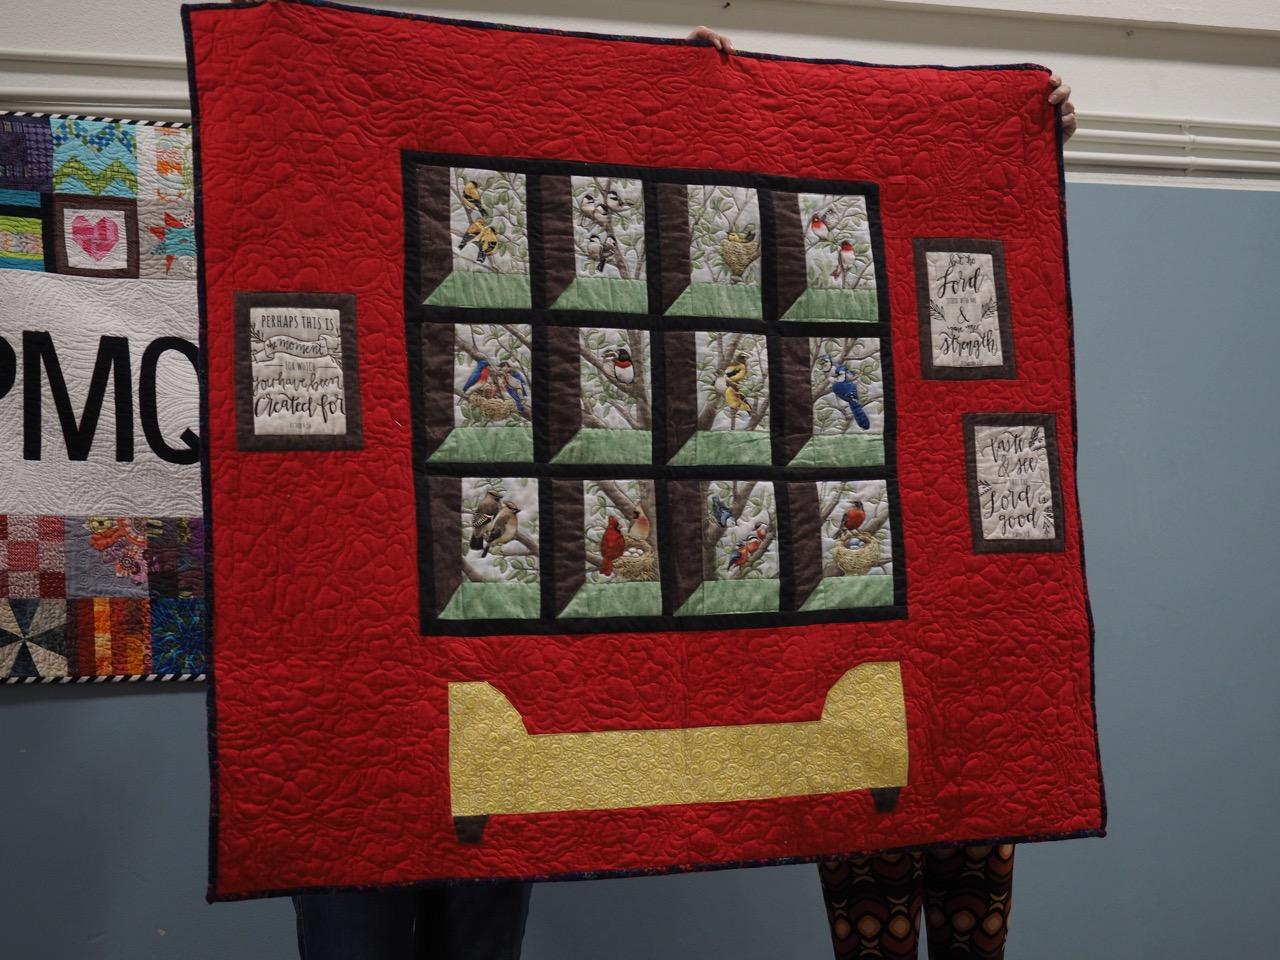 Grandma's Window by Jeanette Wirth